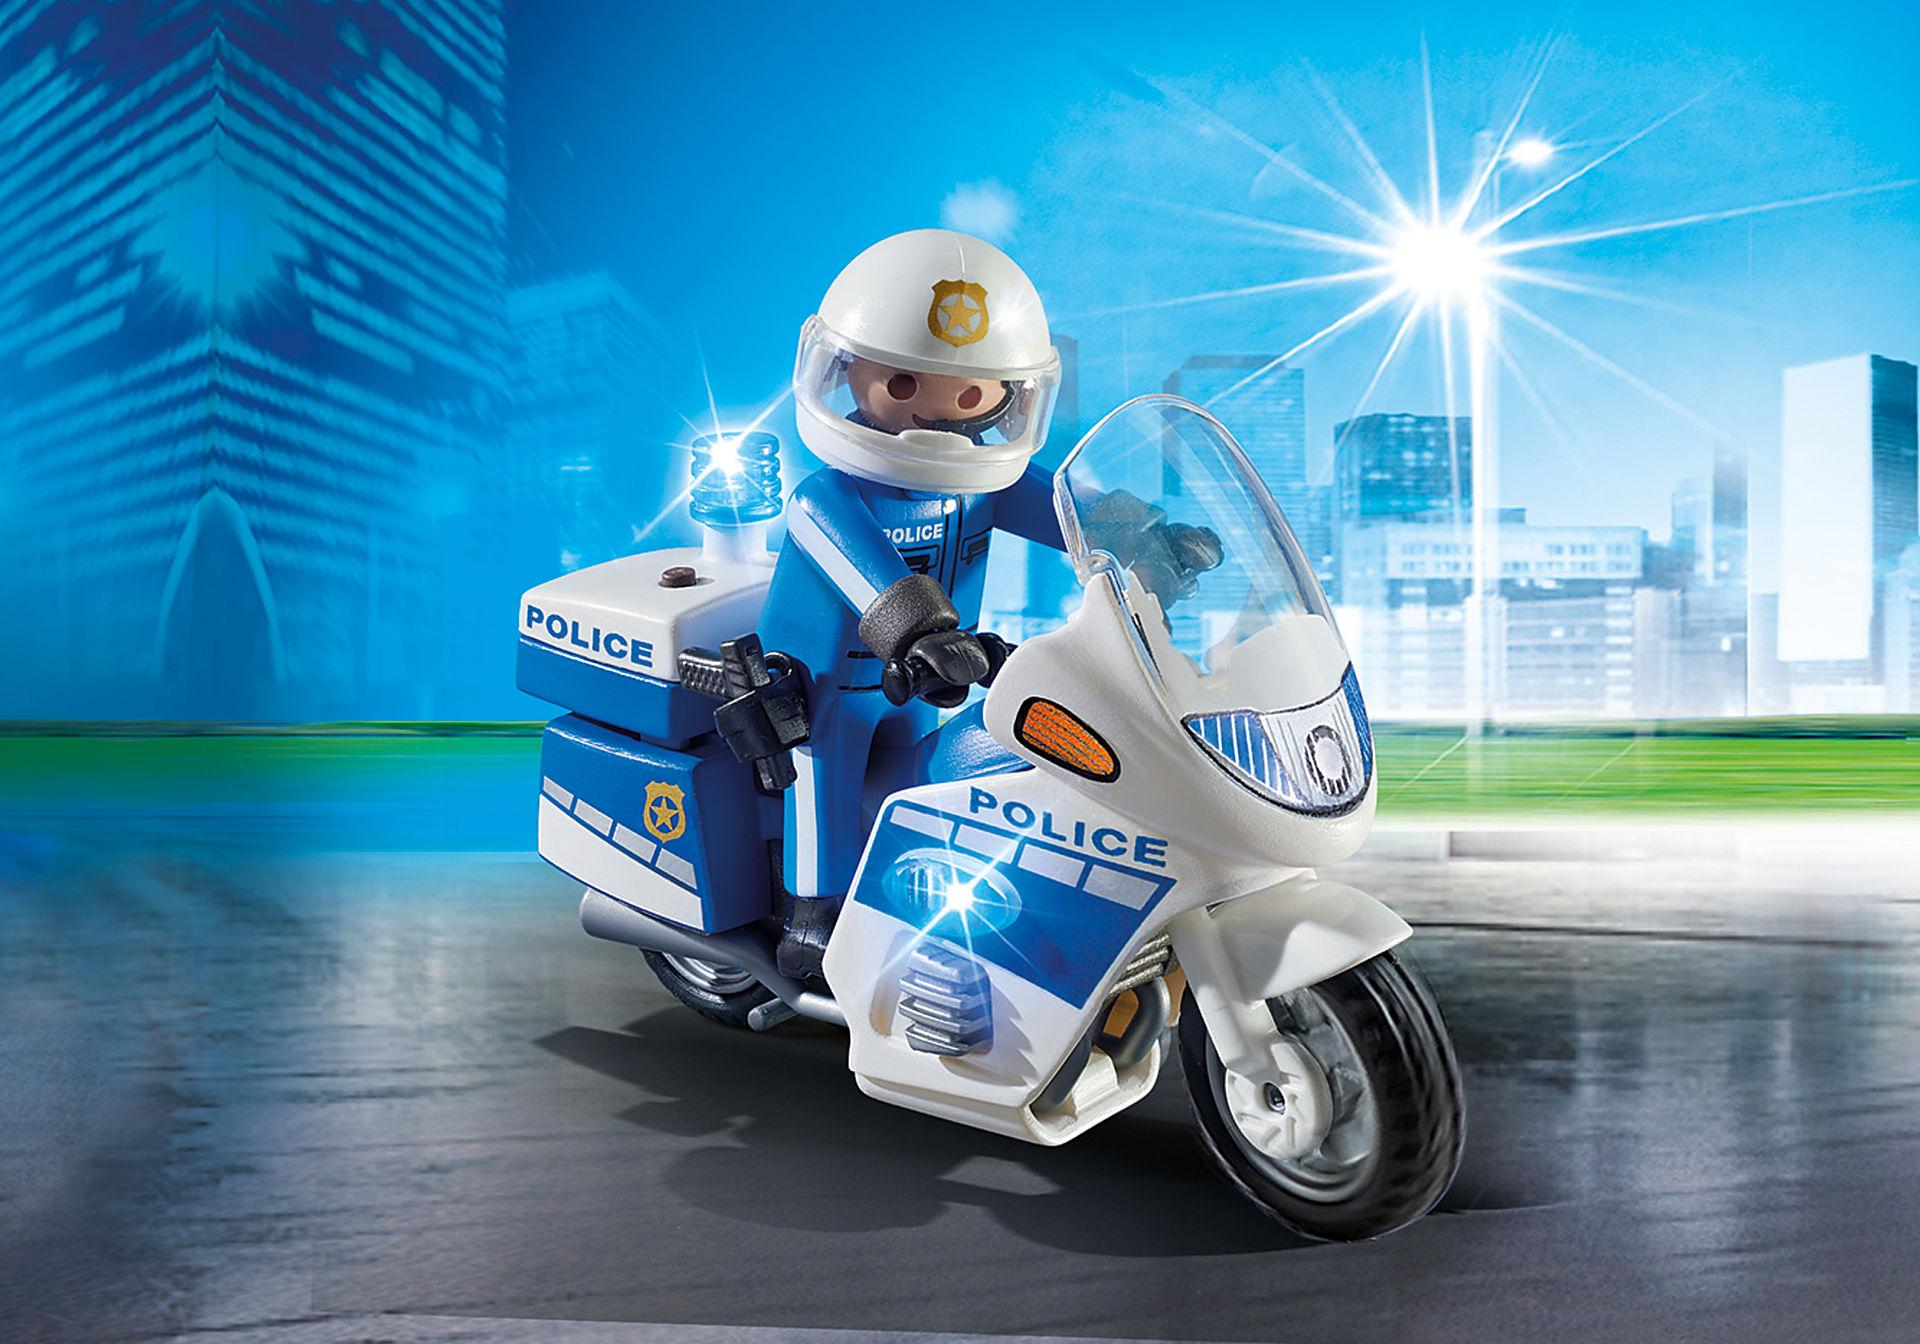 http://media.playmobil.com/i/playmobil/6923_product_detail/Poliscykel med LED-ljus